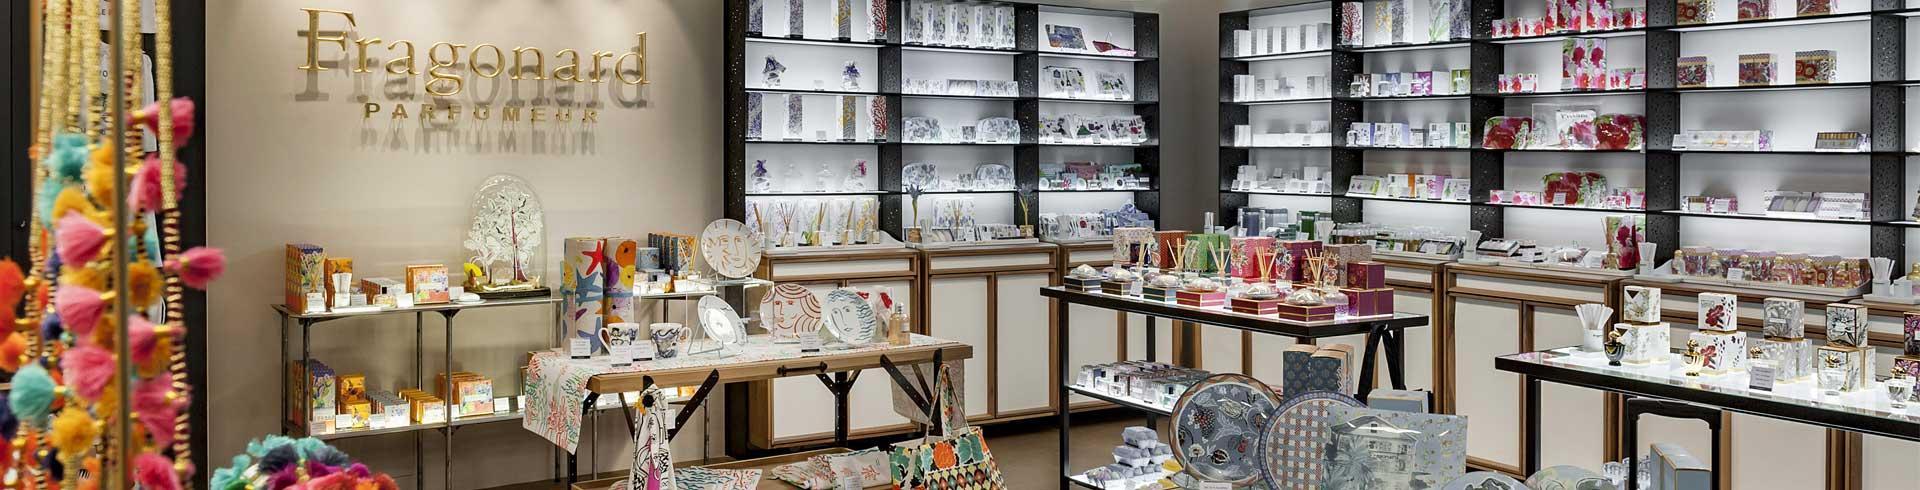 Fragonard Alcools Parfums Terminal 1 Boutiques Services